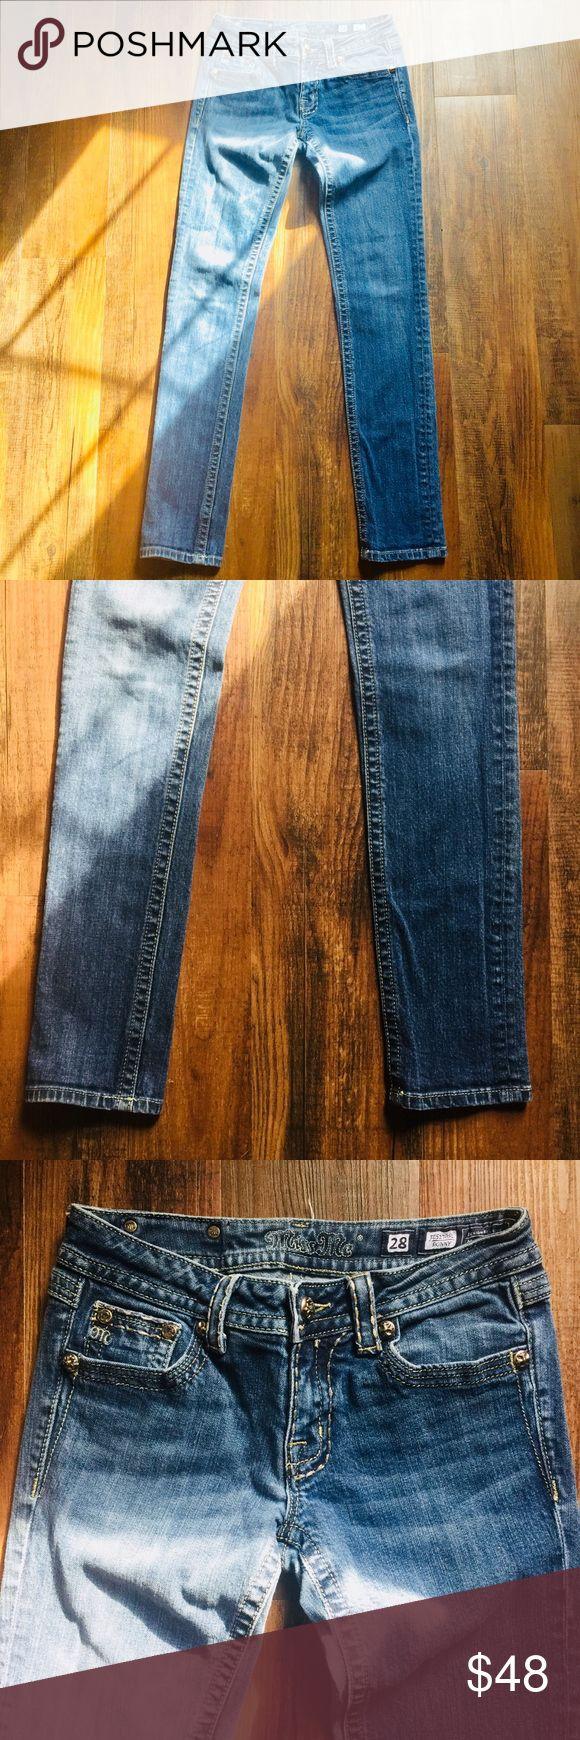 Miss Me Skinny Jeans Size 28 Miss Me Skinny Jeans. Style JES179SL Skinny. Size 28. Miss Me Jeans Skinny